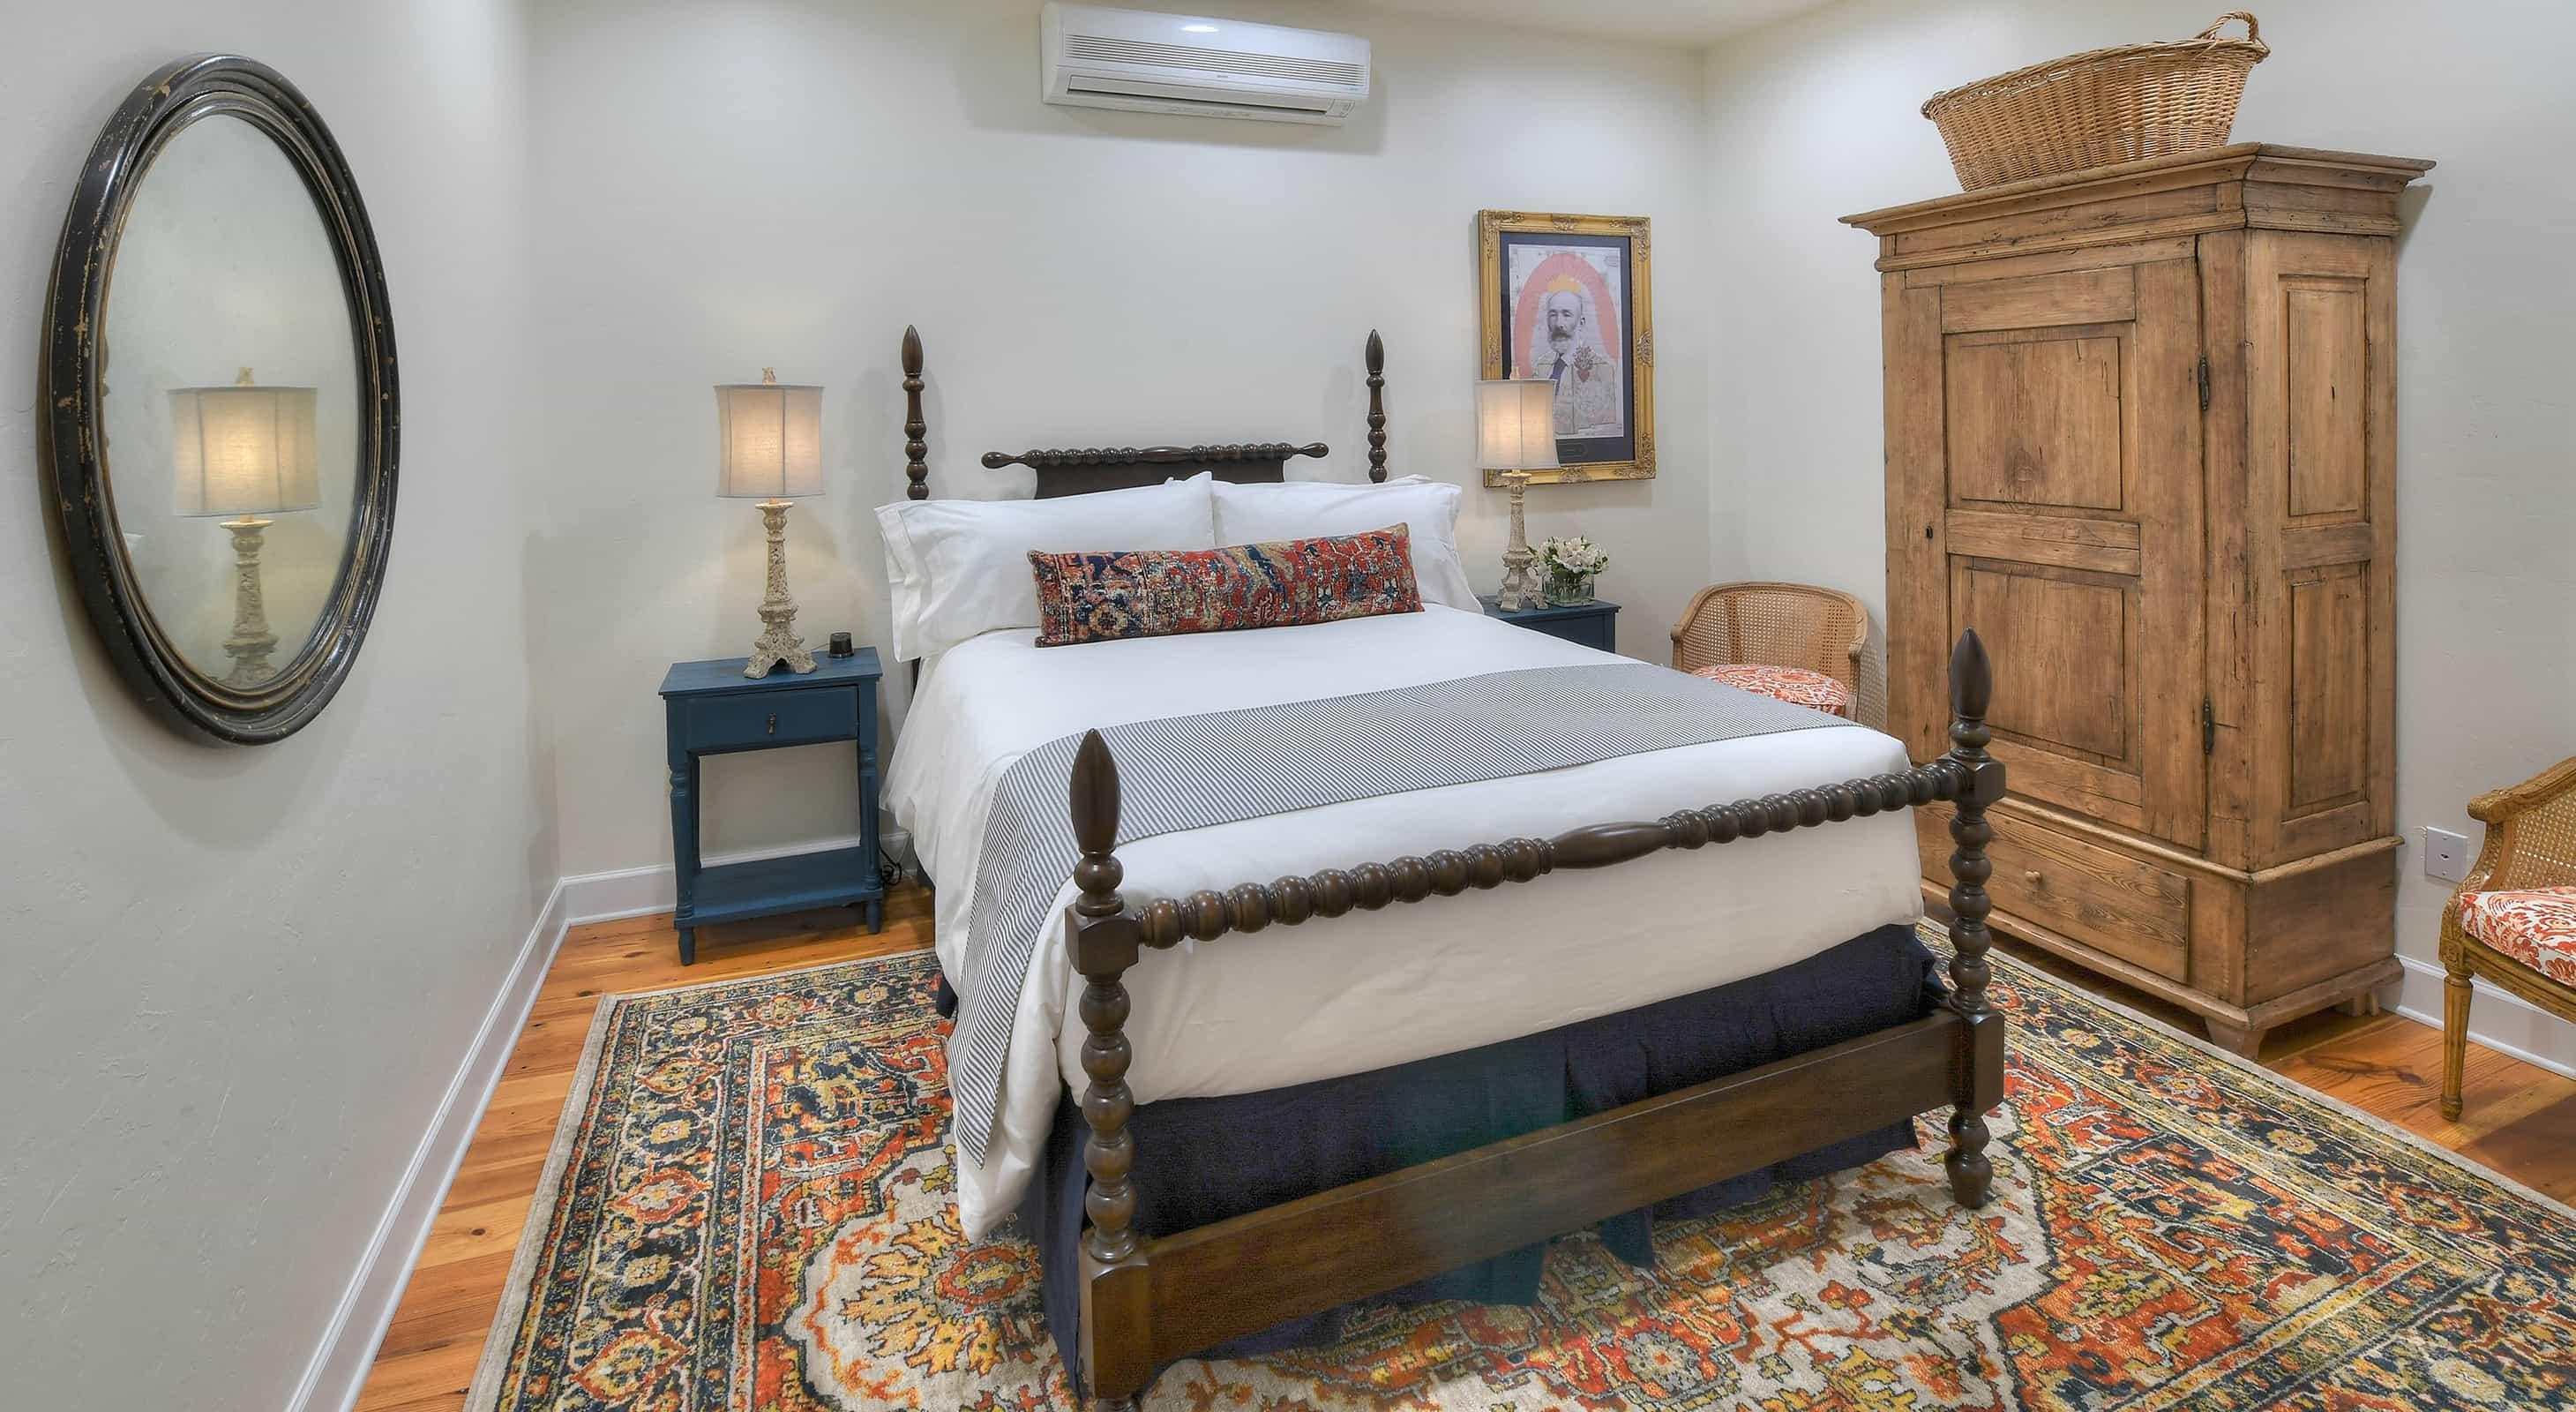 The Estevan Ochoa Room bed